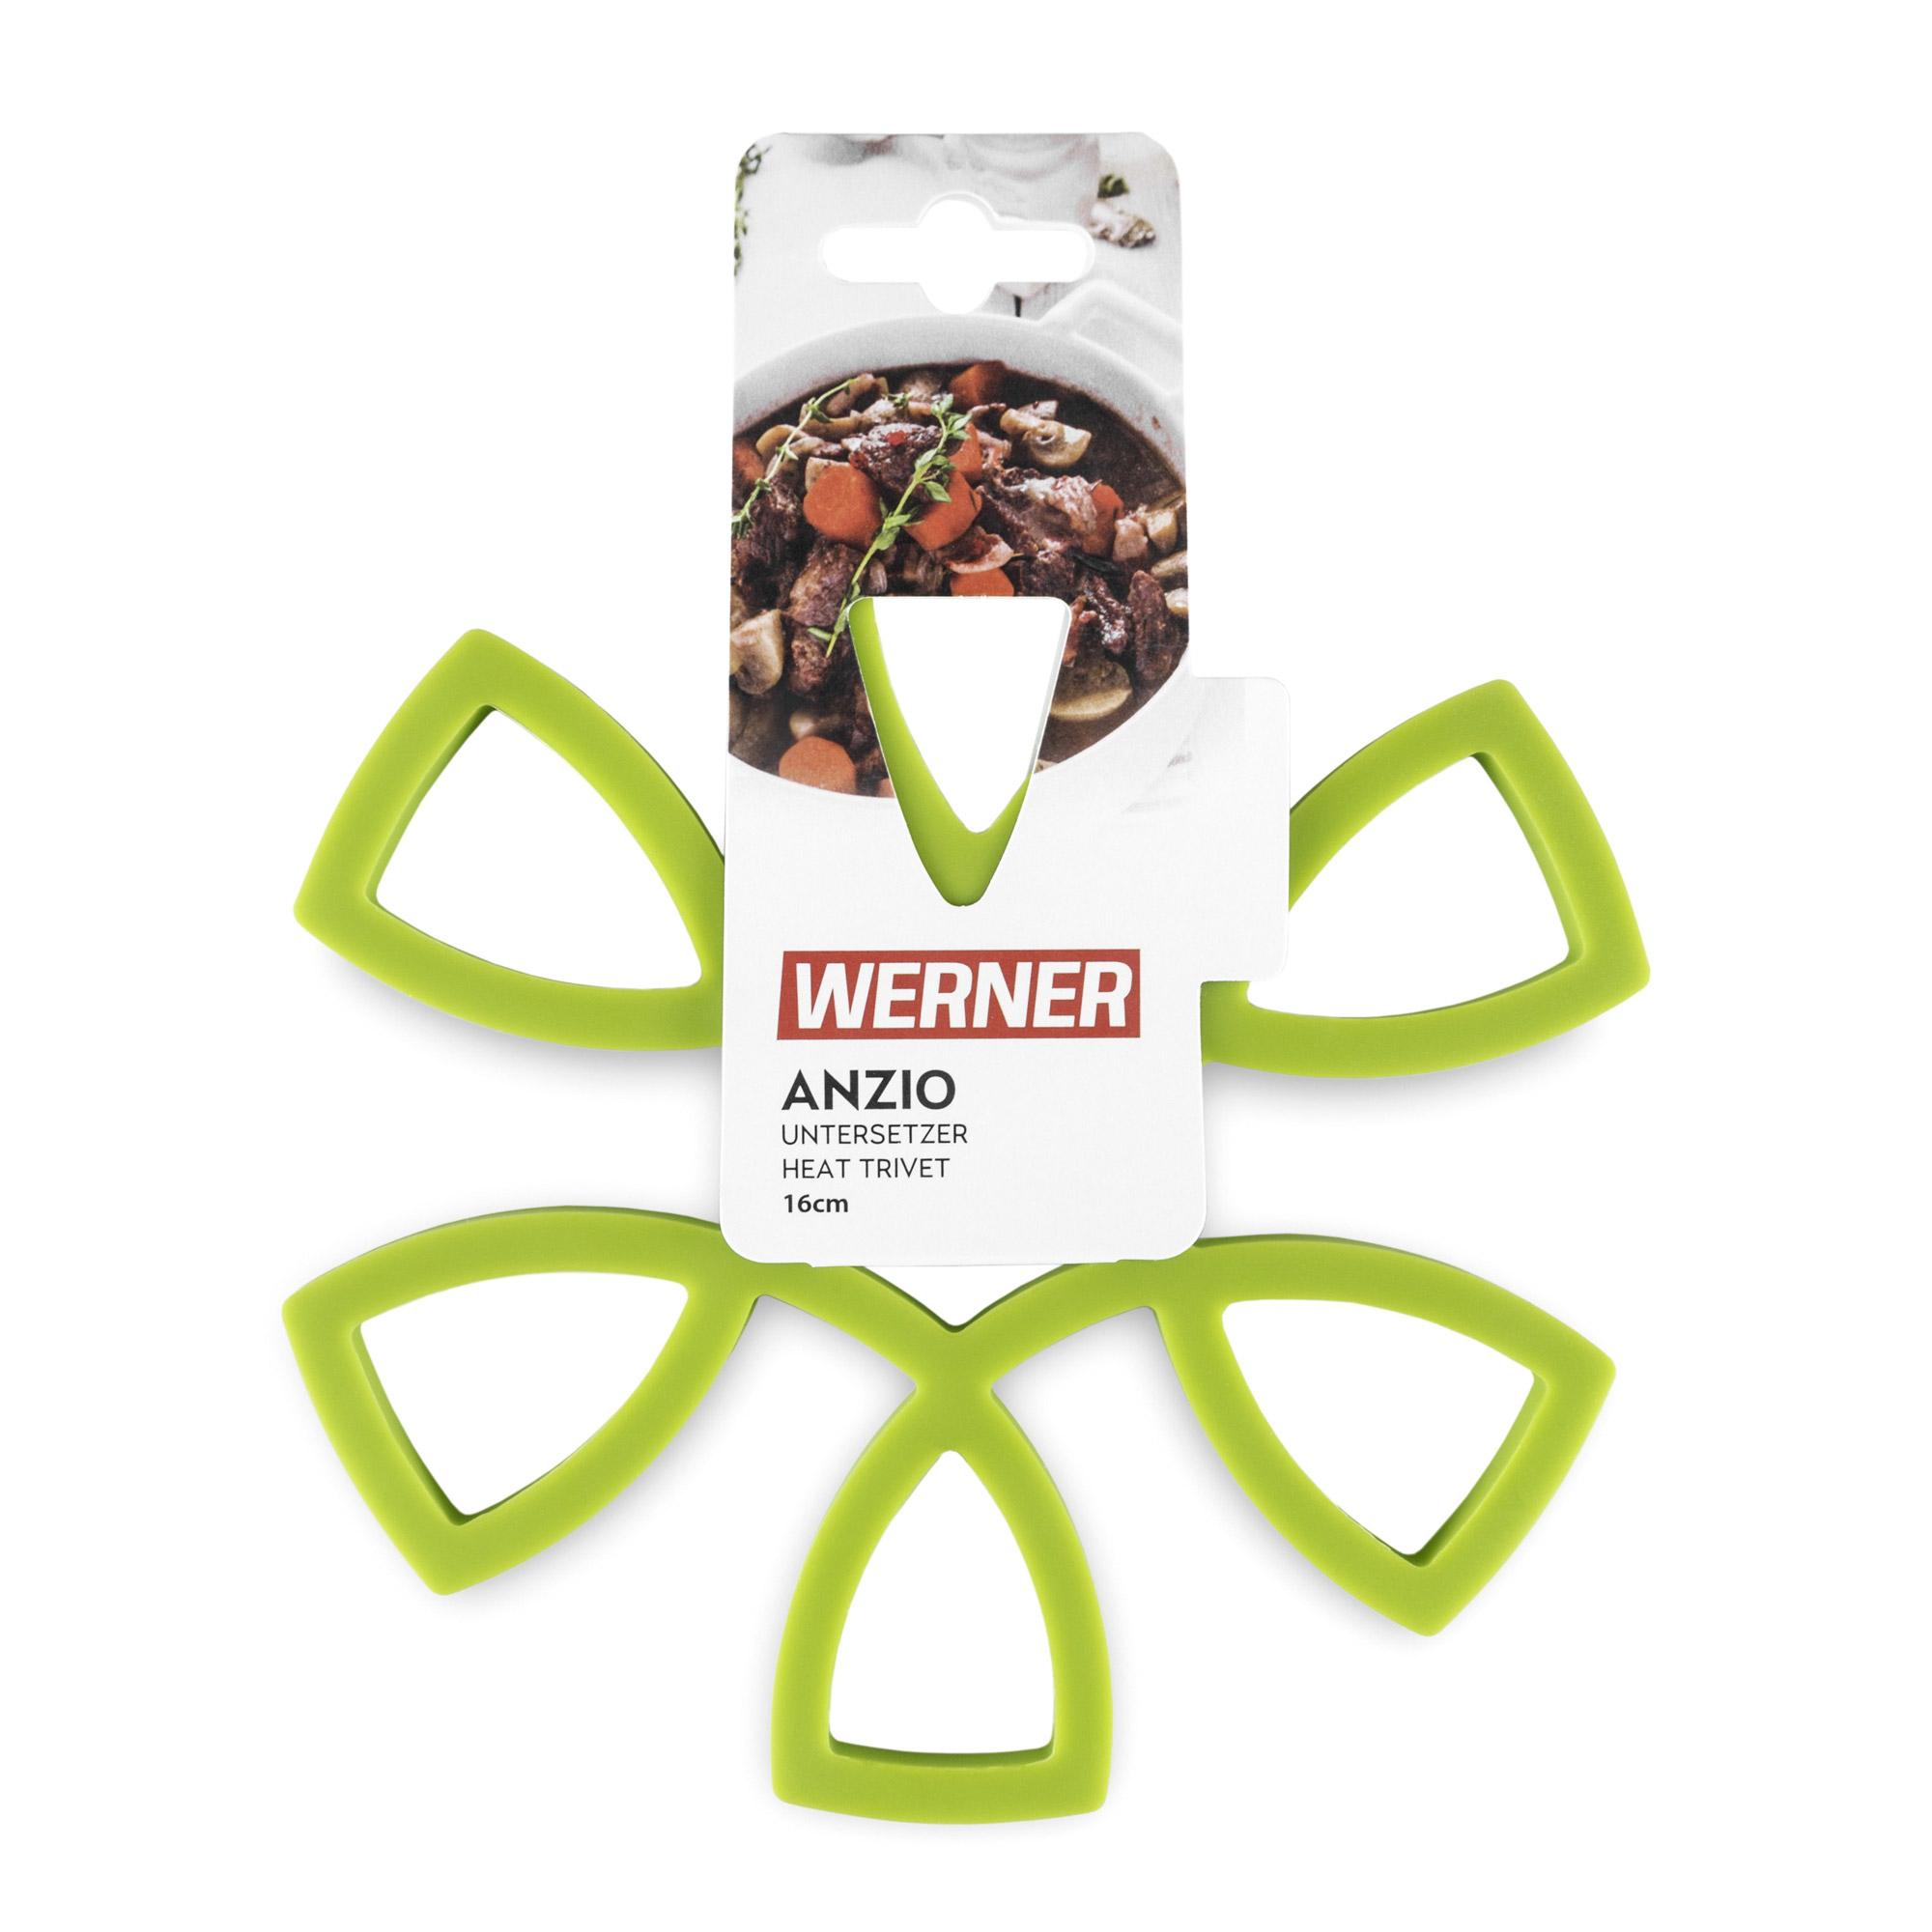 Фото - Силиконовая подставка под горячее Werner Anzio 16 см набор прихваток werner anzio 50025 2 шт